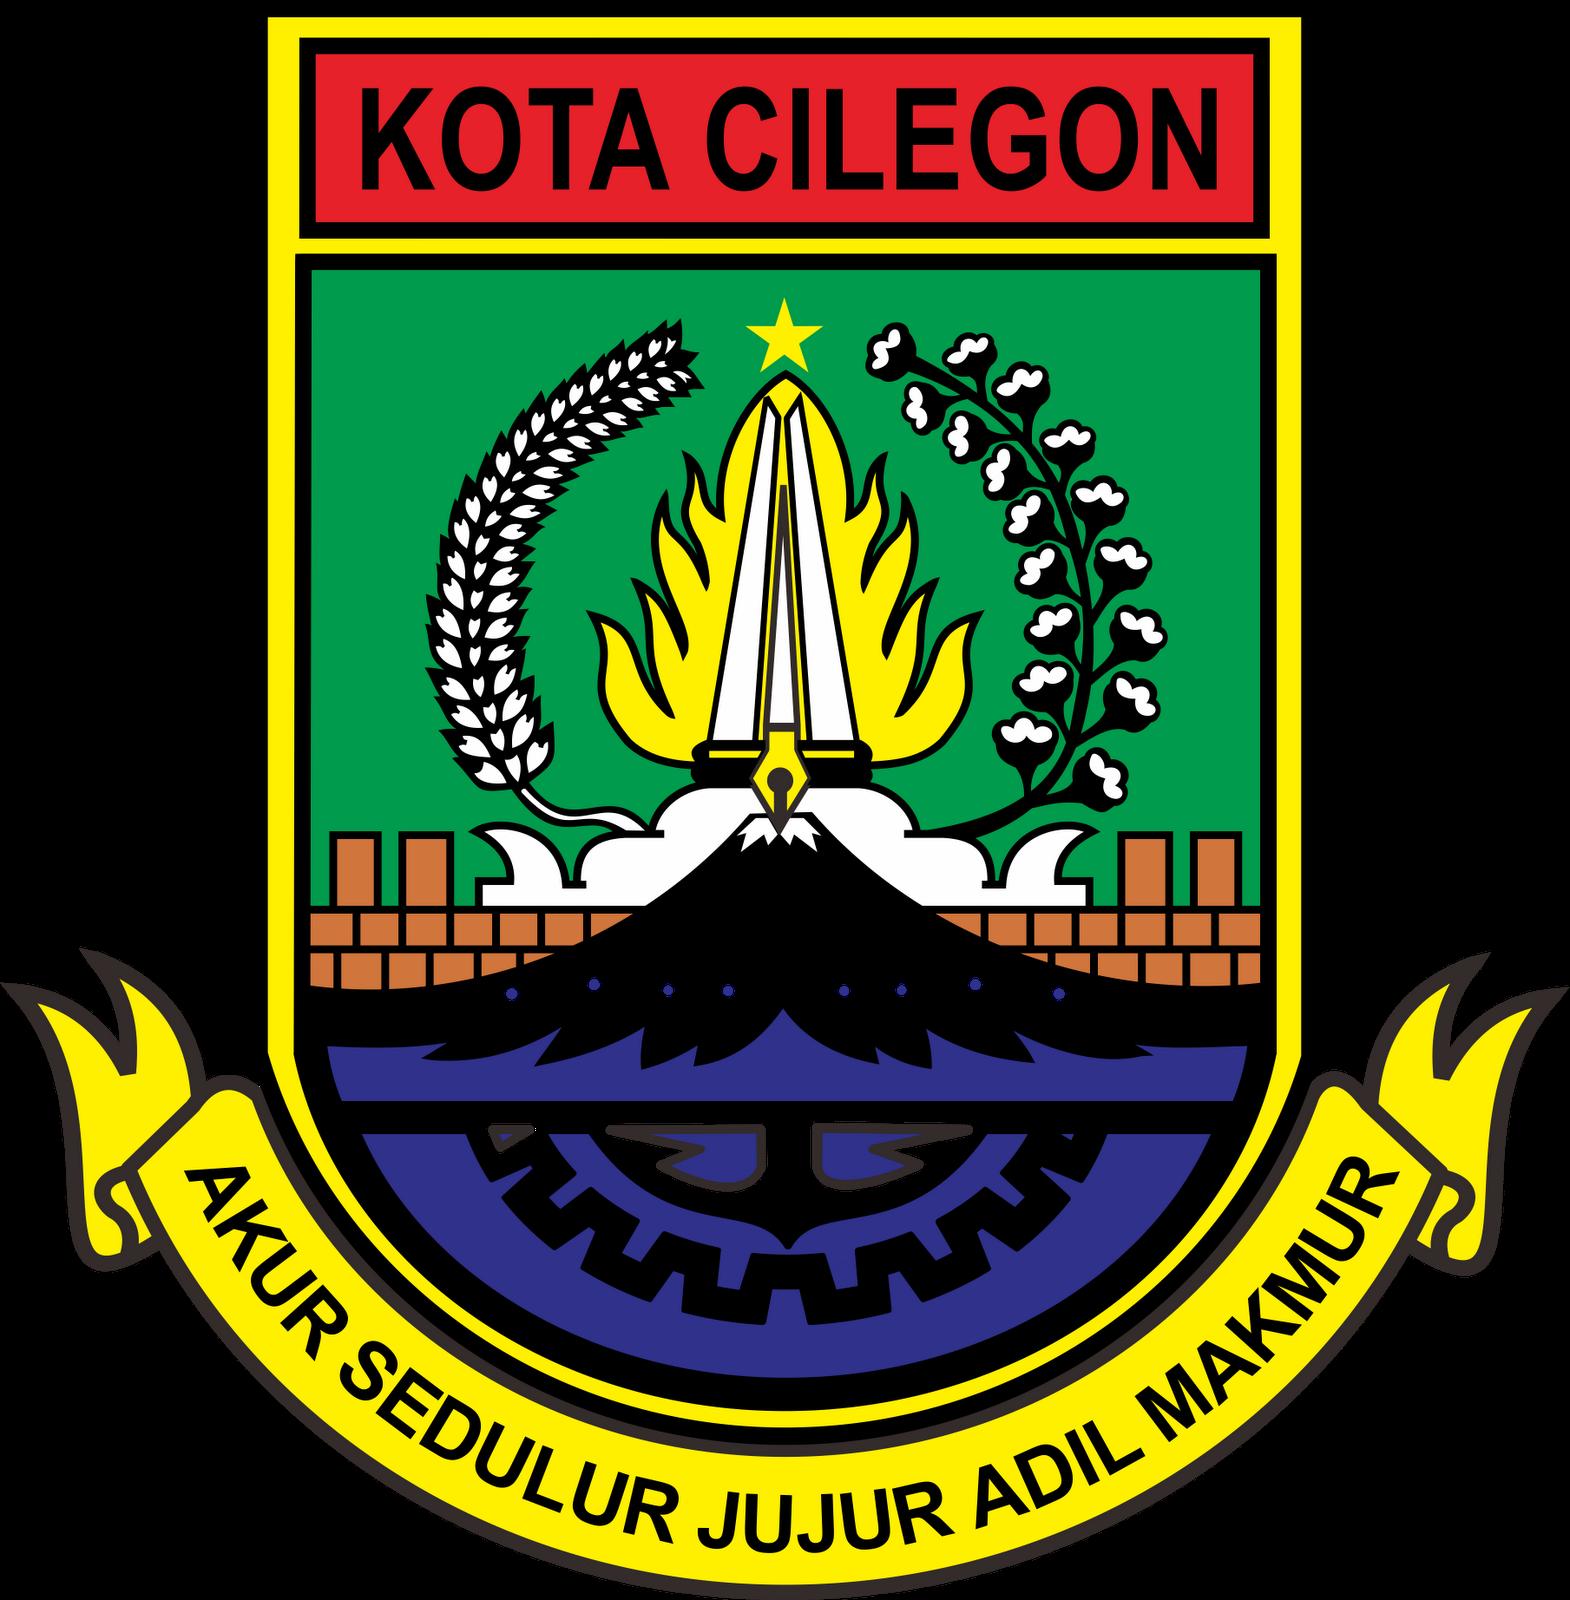 https://upload.wikimedia.org/wikipedia/commons/d/de/Lambang_Kota_Cilegon.png